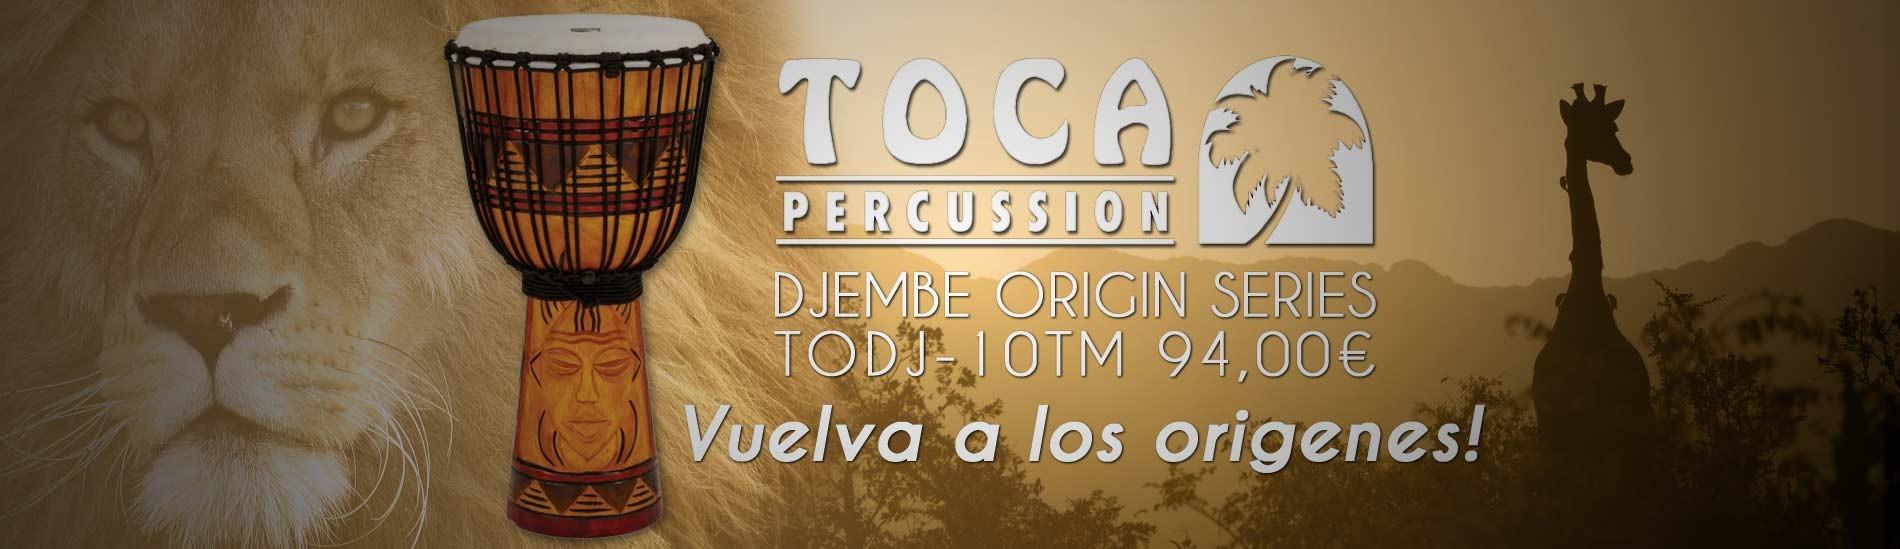 Djembe Toca Percussion TODJ-10TM Origin Series